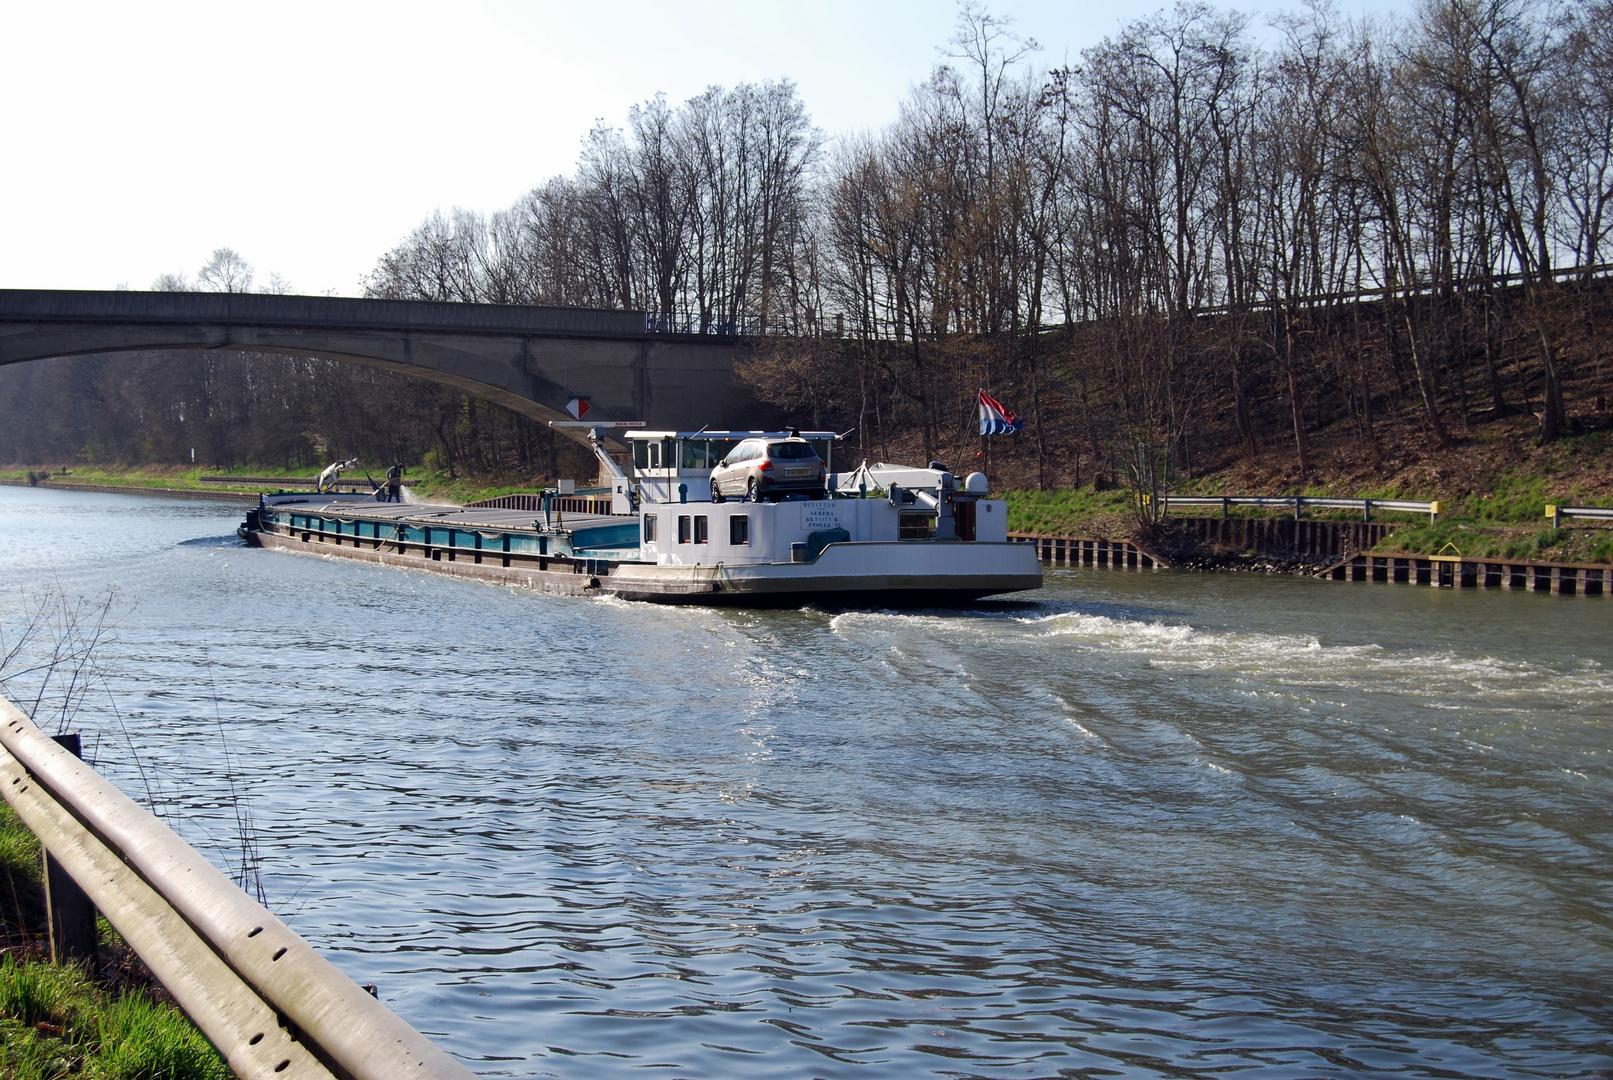 23.04.2013 Stichkanal bei Vechelde